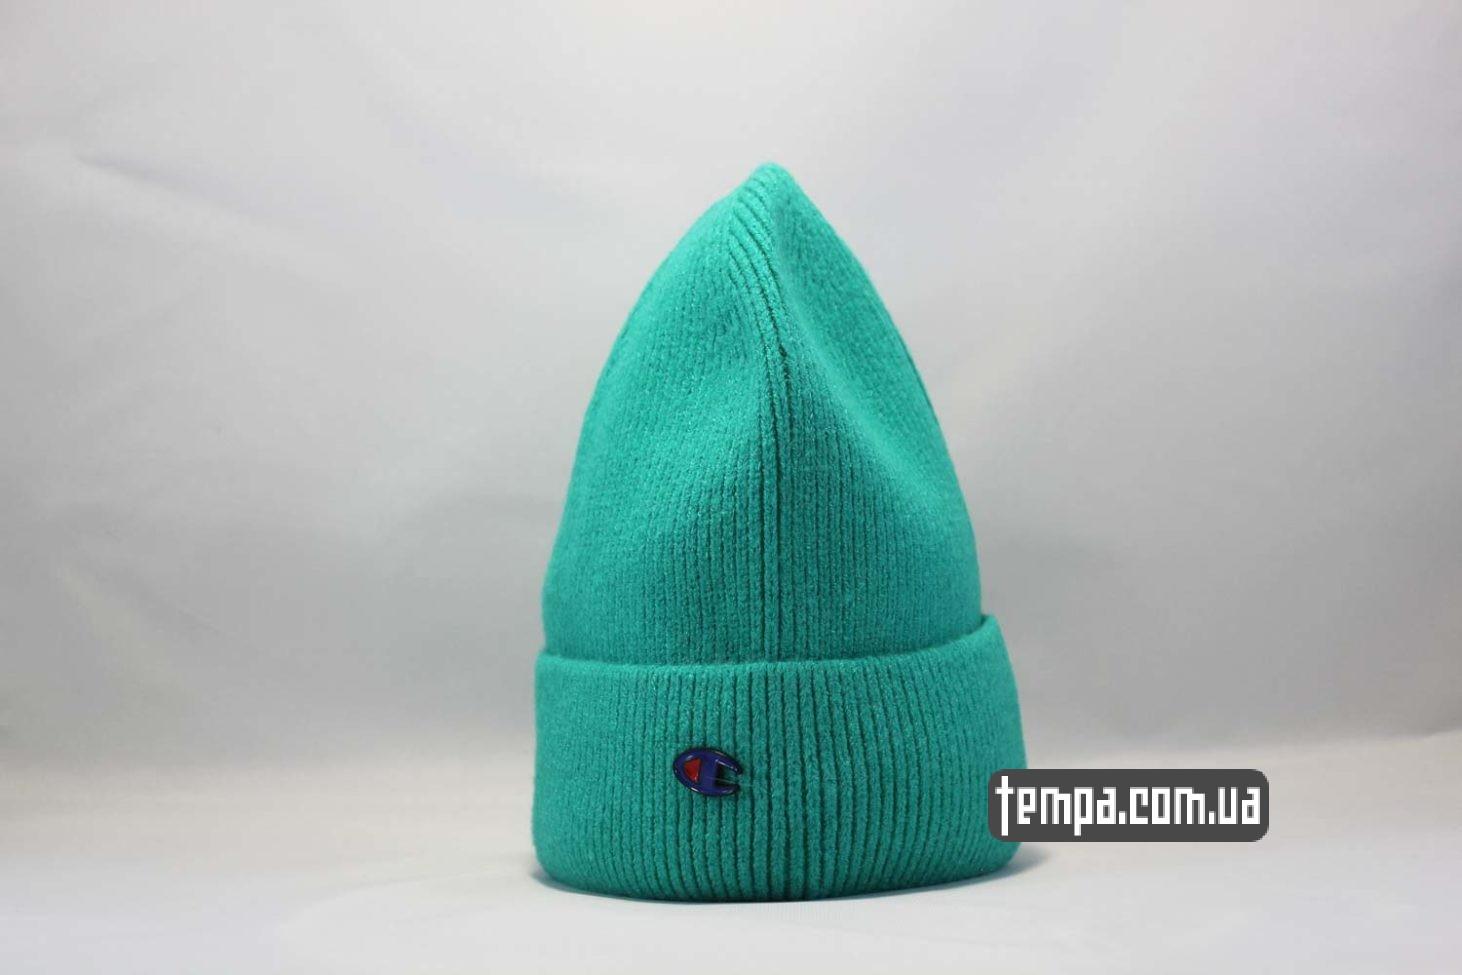 бини украина шапка beanie Champion green зеленая купить Украина